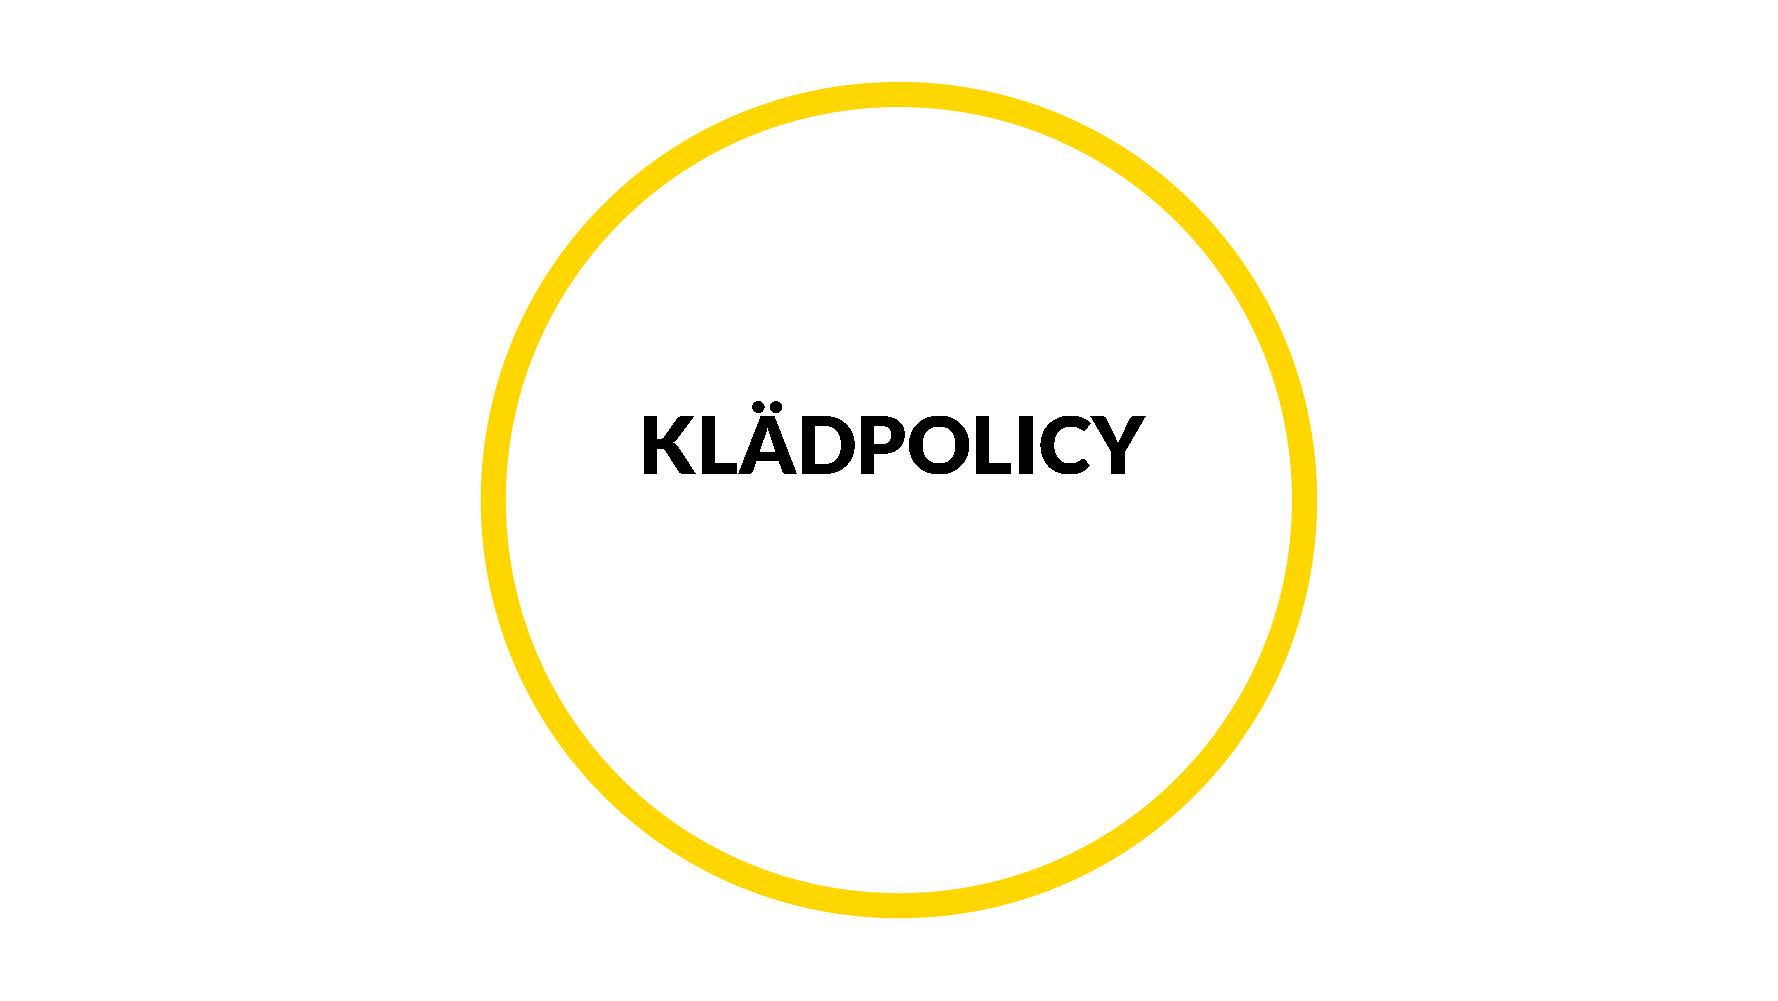 Klädpolicy